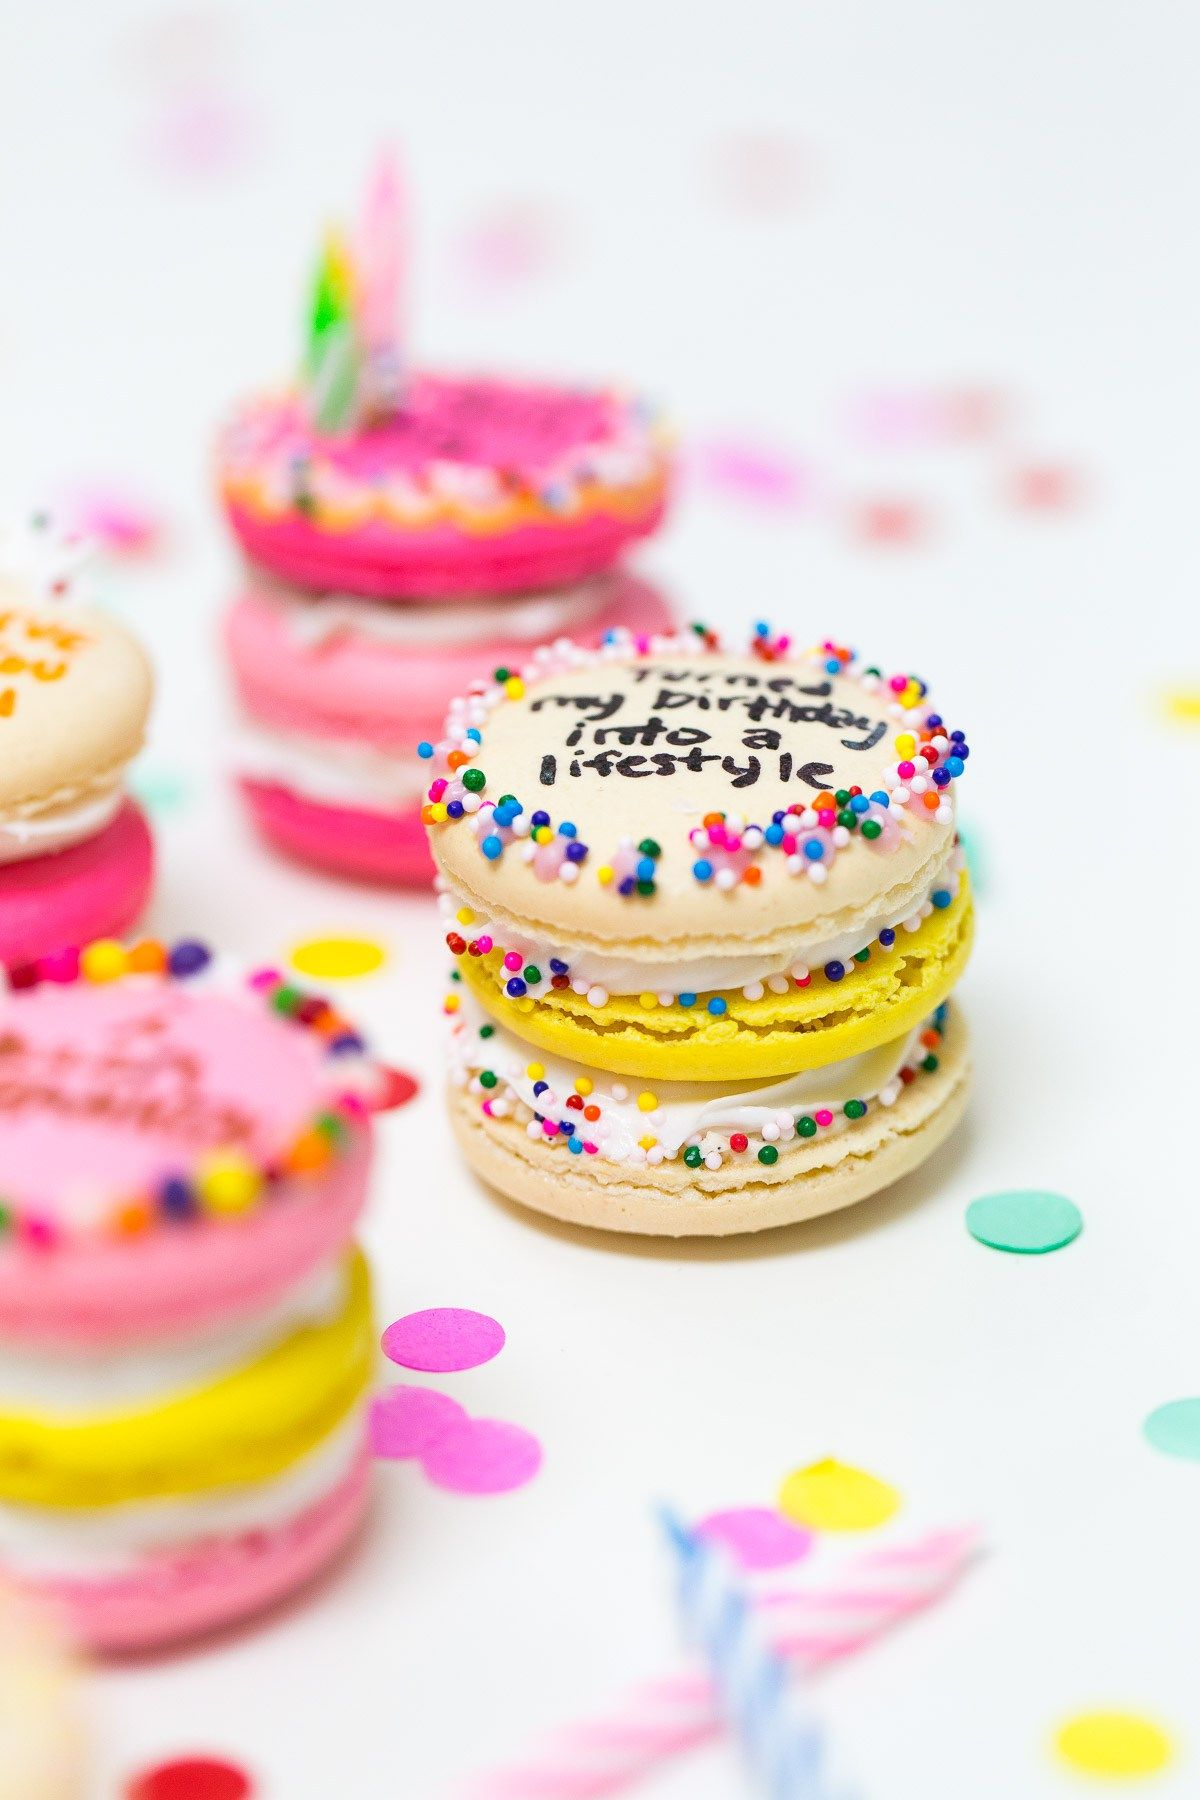 Drake On Cake Inspired Birthday Cake Macarons Yummy Cupcakes